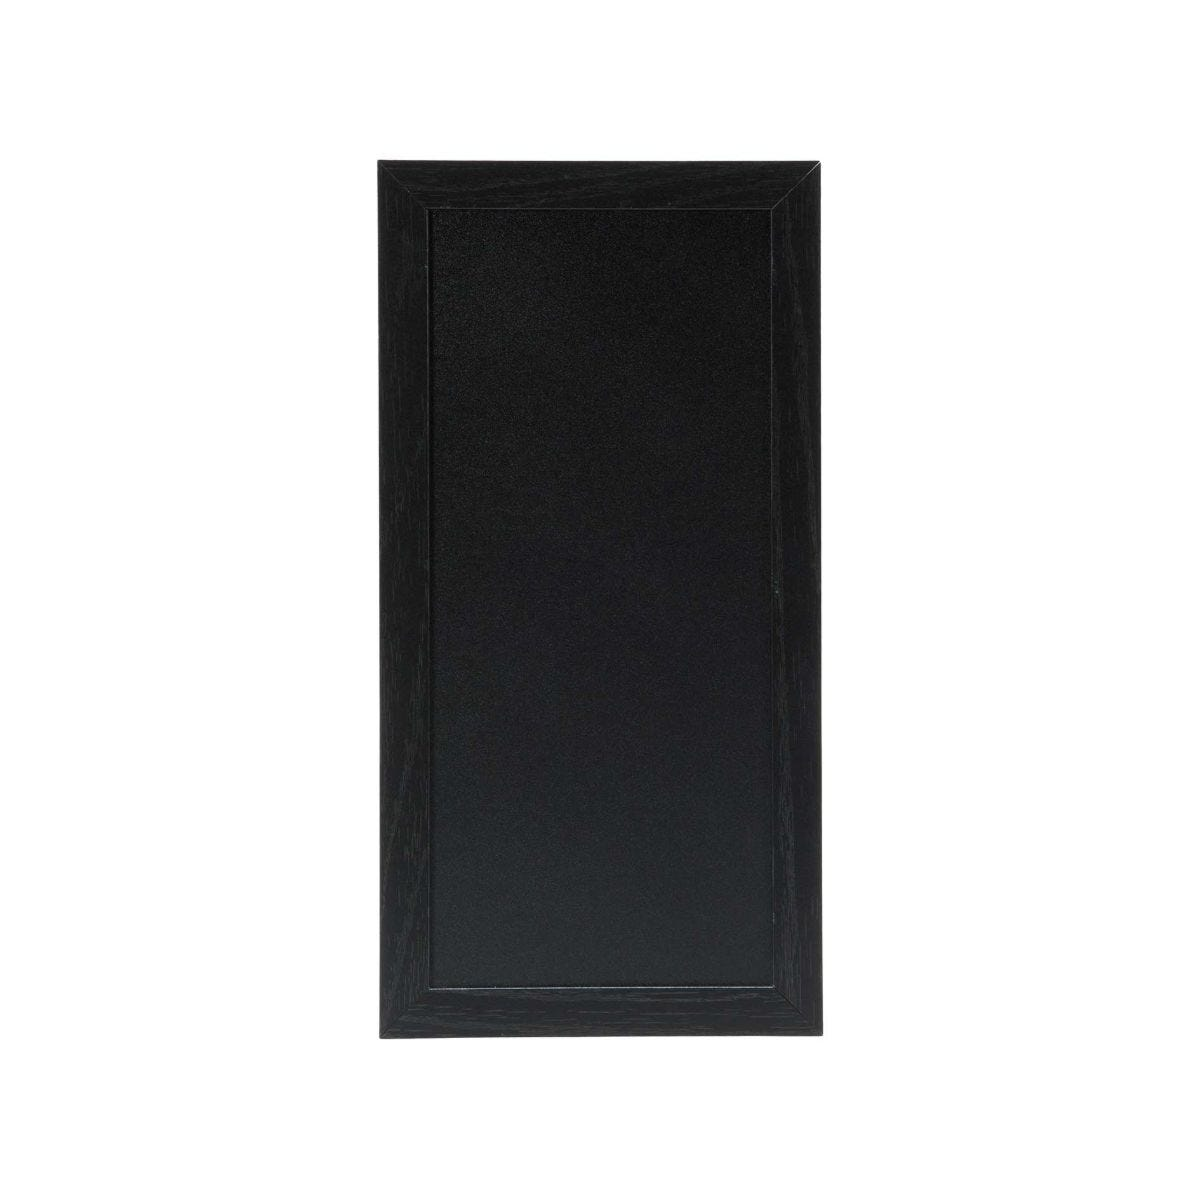 Securit Chalk Board with Black Frame - 20 x 40cm Teak